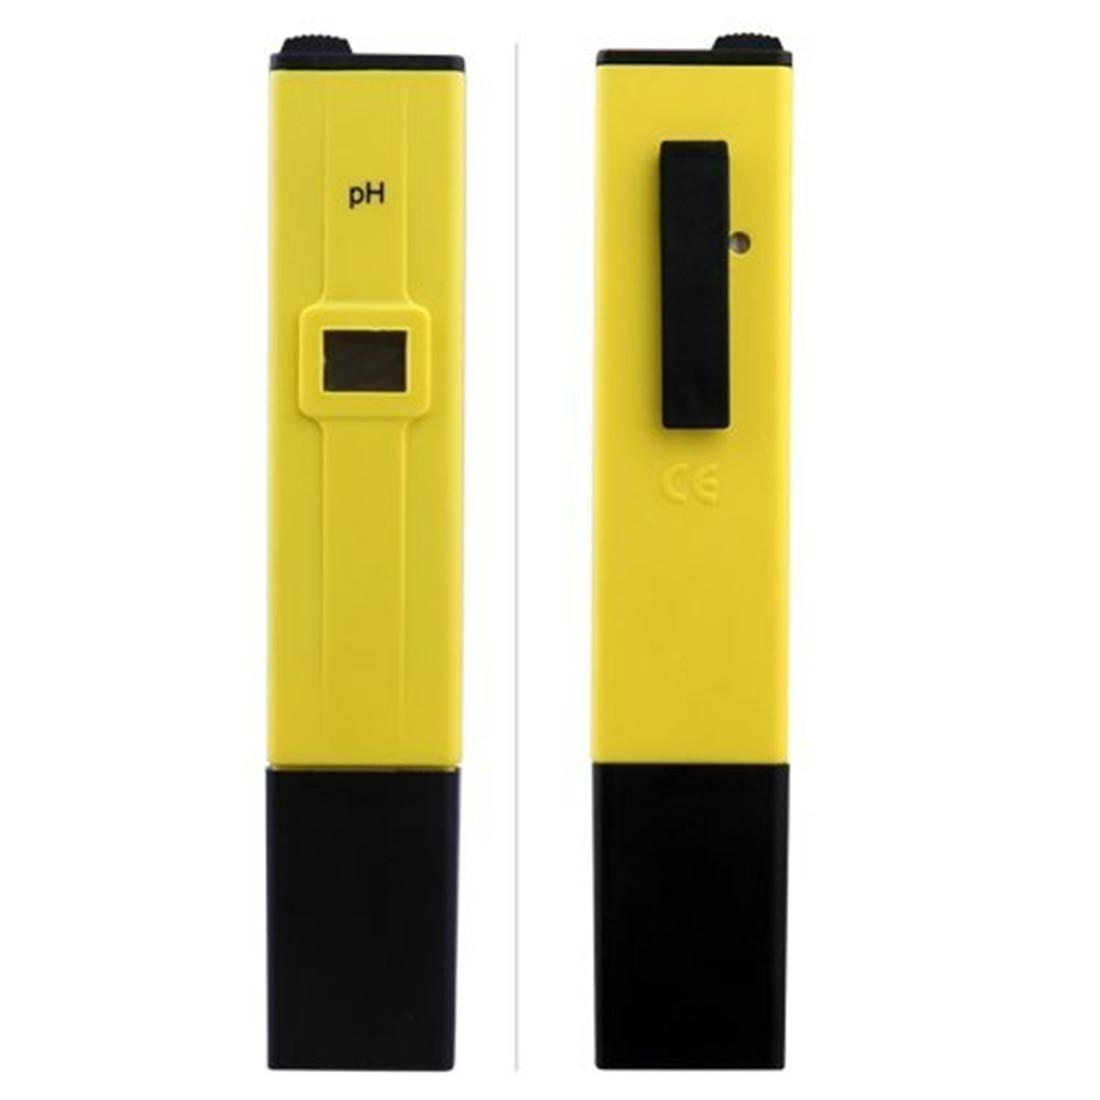 Hydroponics Aquarium Pool Water Test Tools Backlight LCD Digital 0-14 PH Meter Conductivity Tester